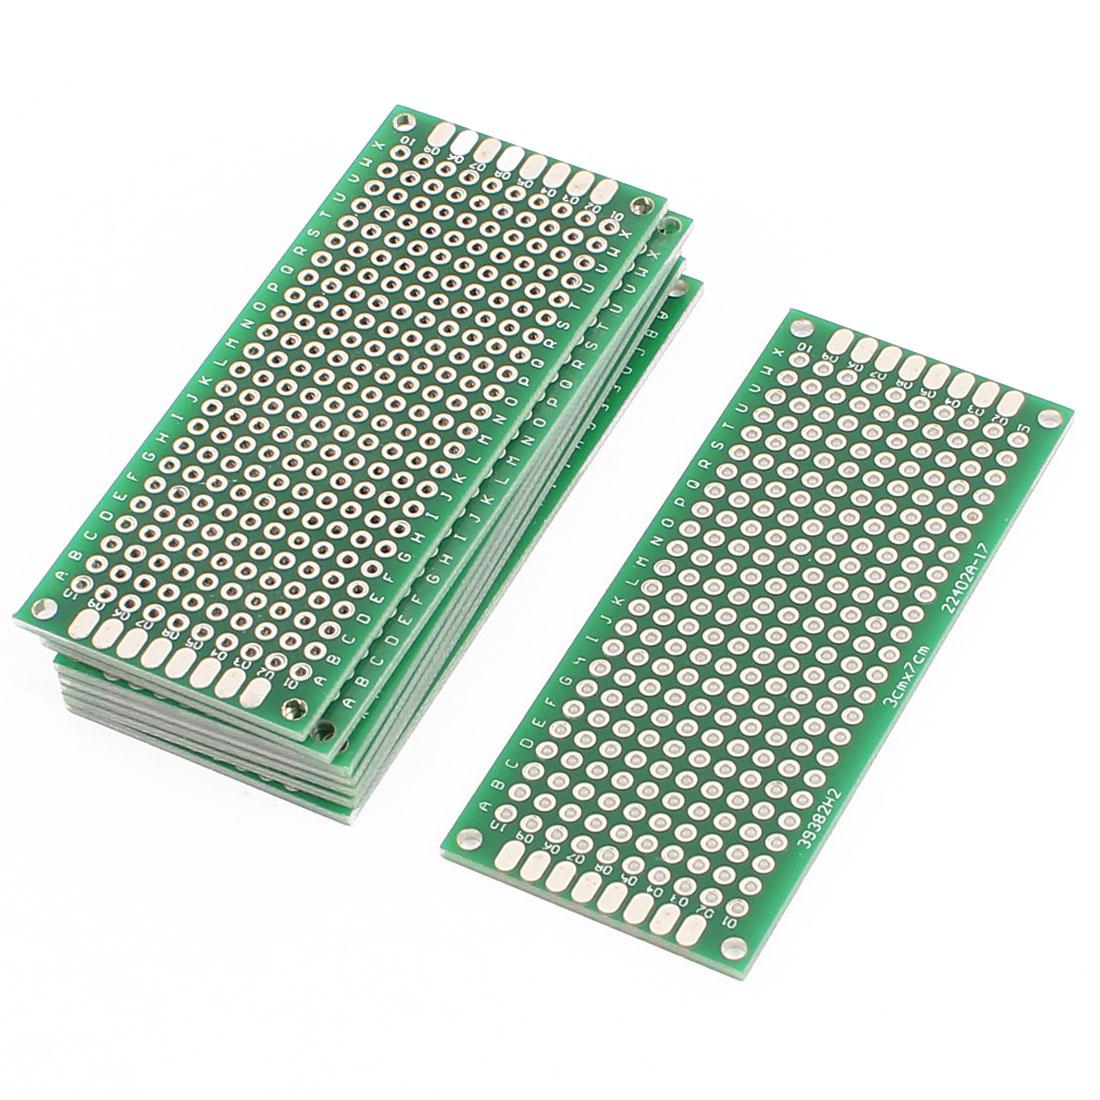 8 Pcs 3 x 7cm Double-Side Prototype Solderable Paper Universal PCB Board